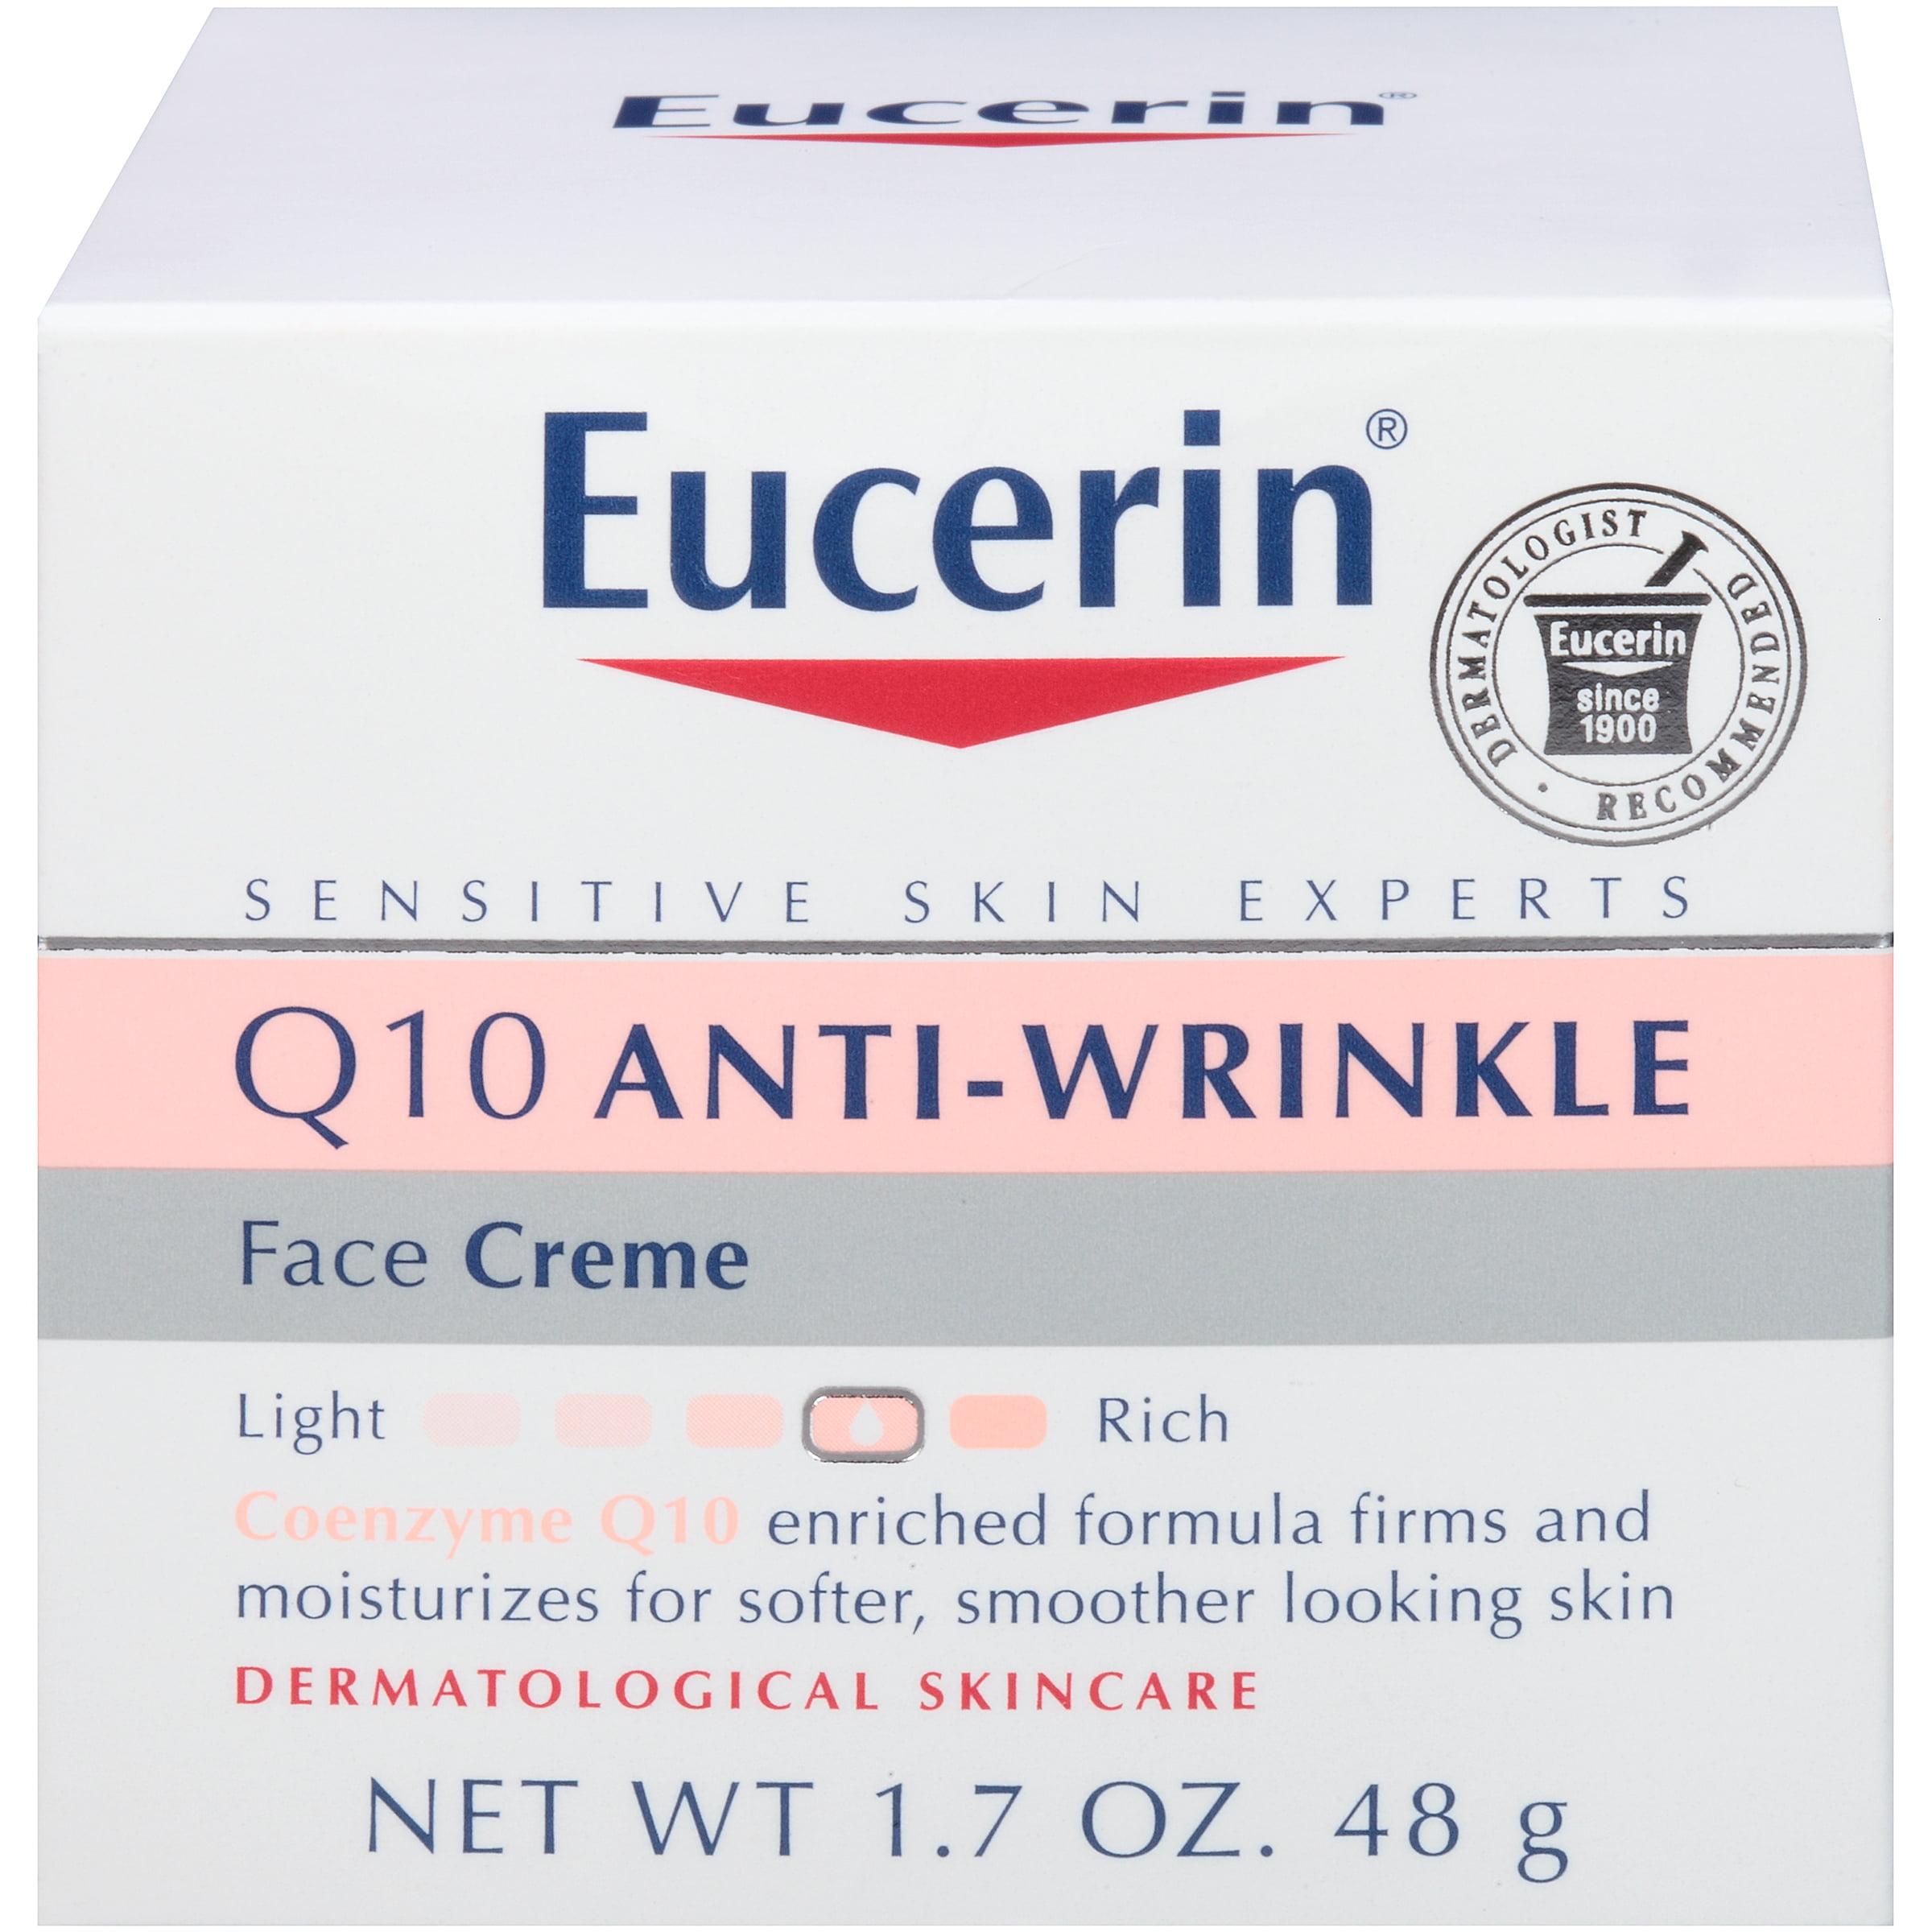 d9e194588ca Eucerin Q10 Anti-Wrinkle Sensitive Skin Face Creme 1.7 oz. - Walmart.com